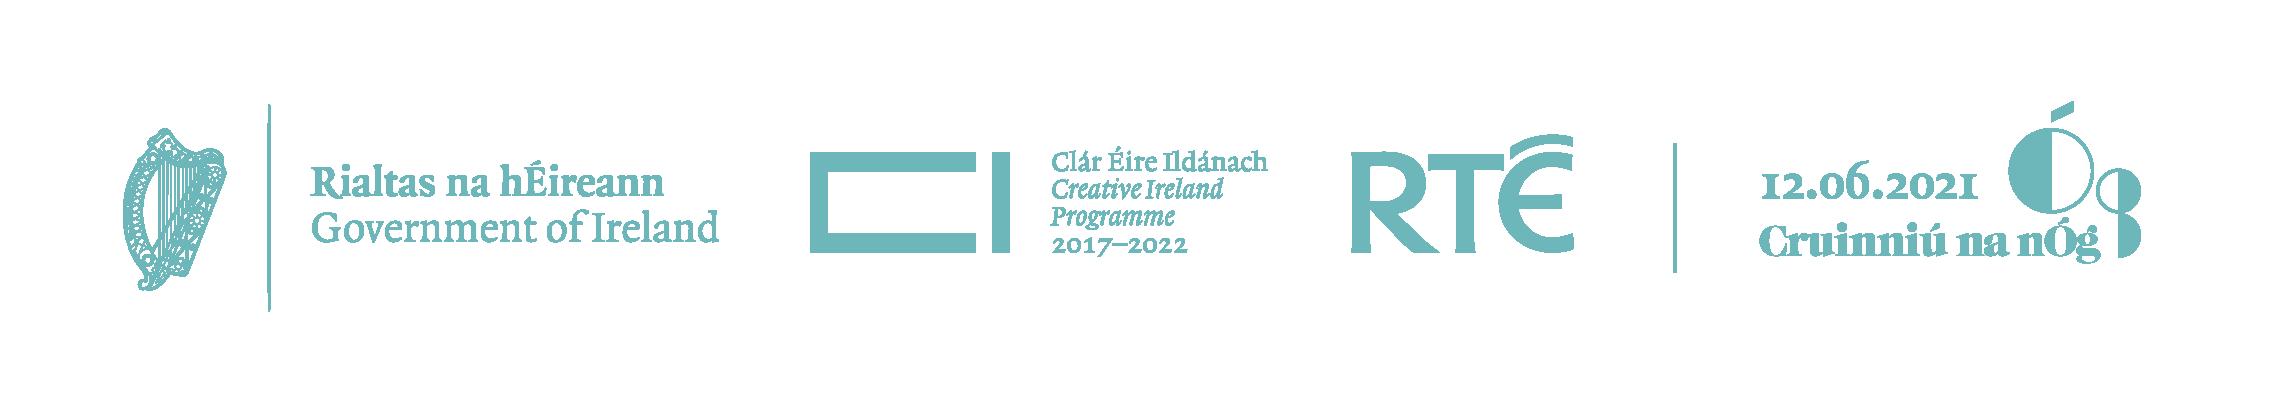 Cruinniu na nÓg Partner Logos 2021